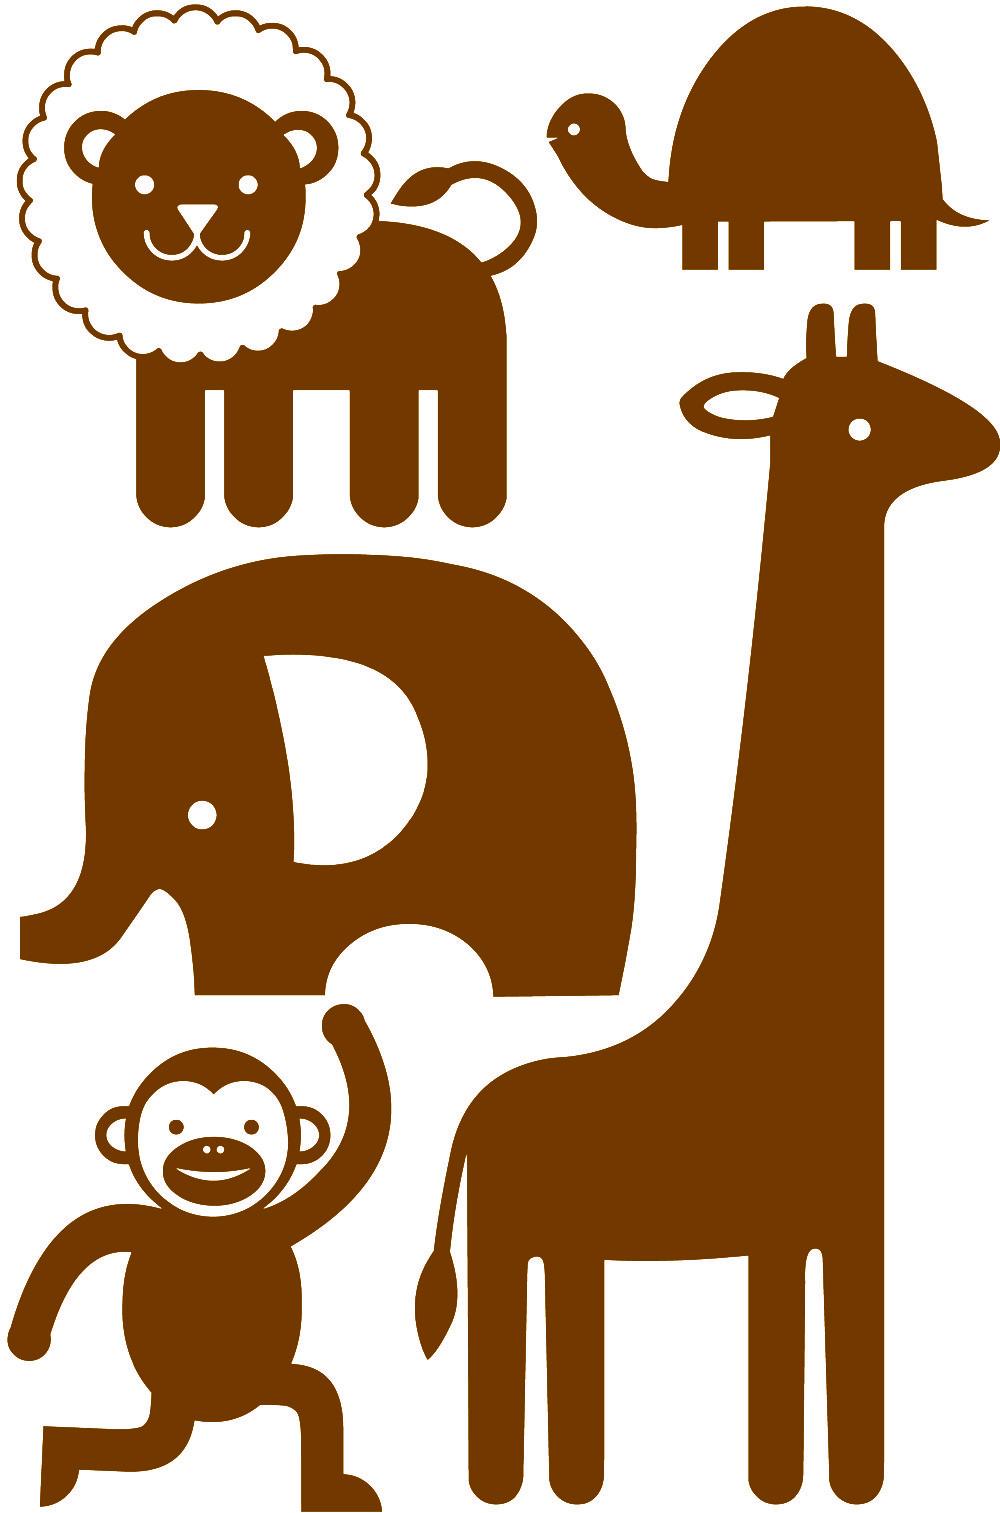 Leeuw Schildpad Olifant Aap Giraf Geboortekaartje